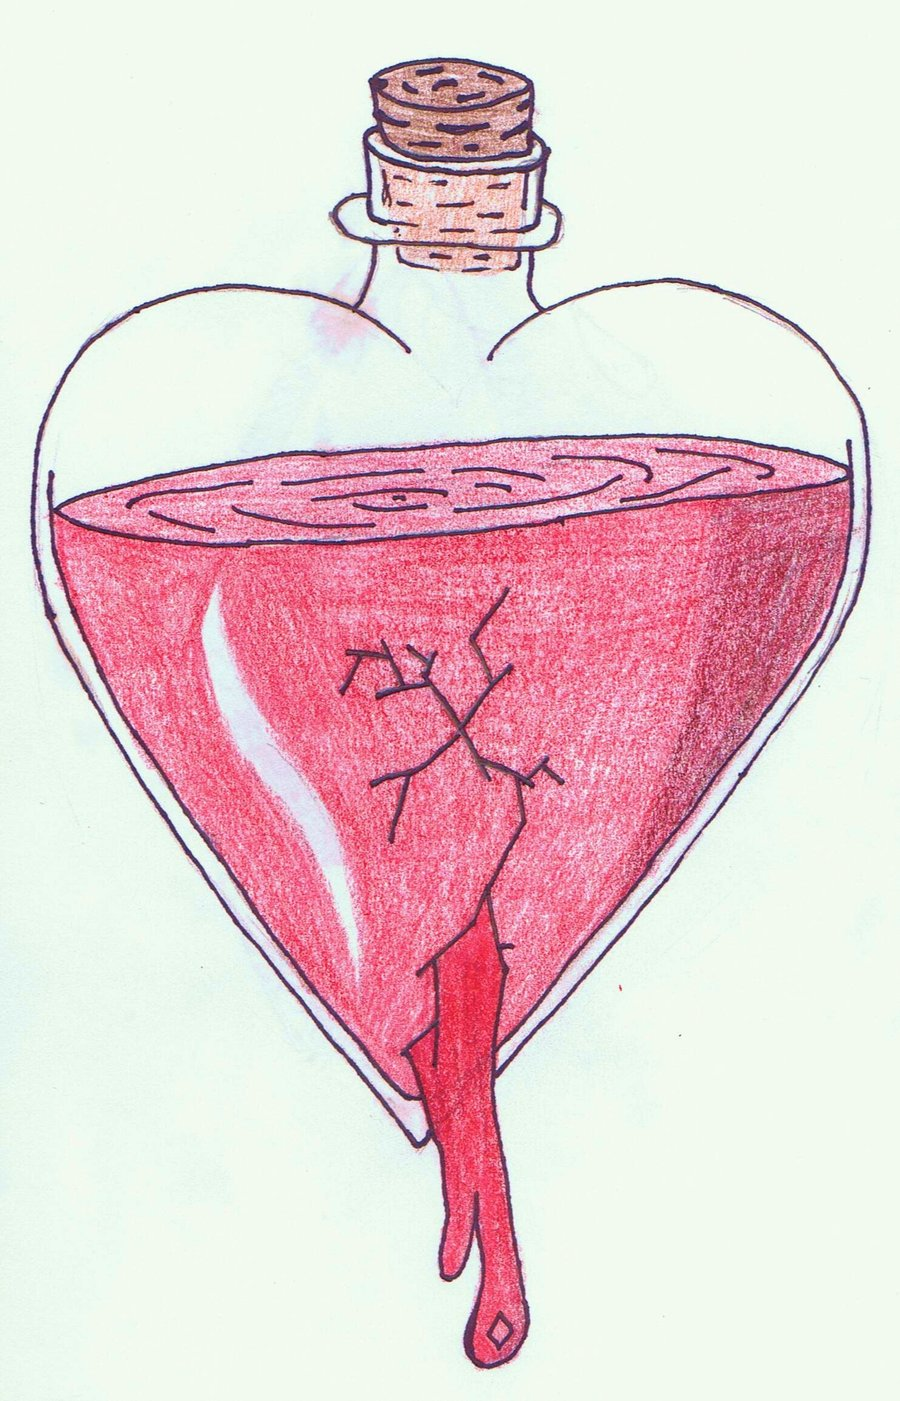 900x1401 Bleeding Heart By Peace 88